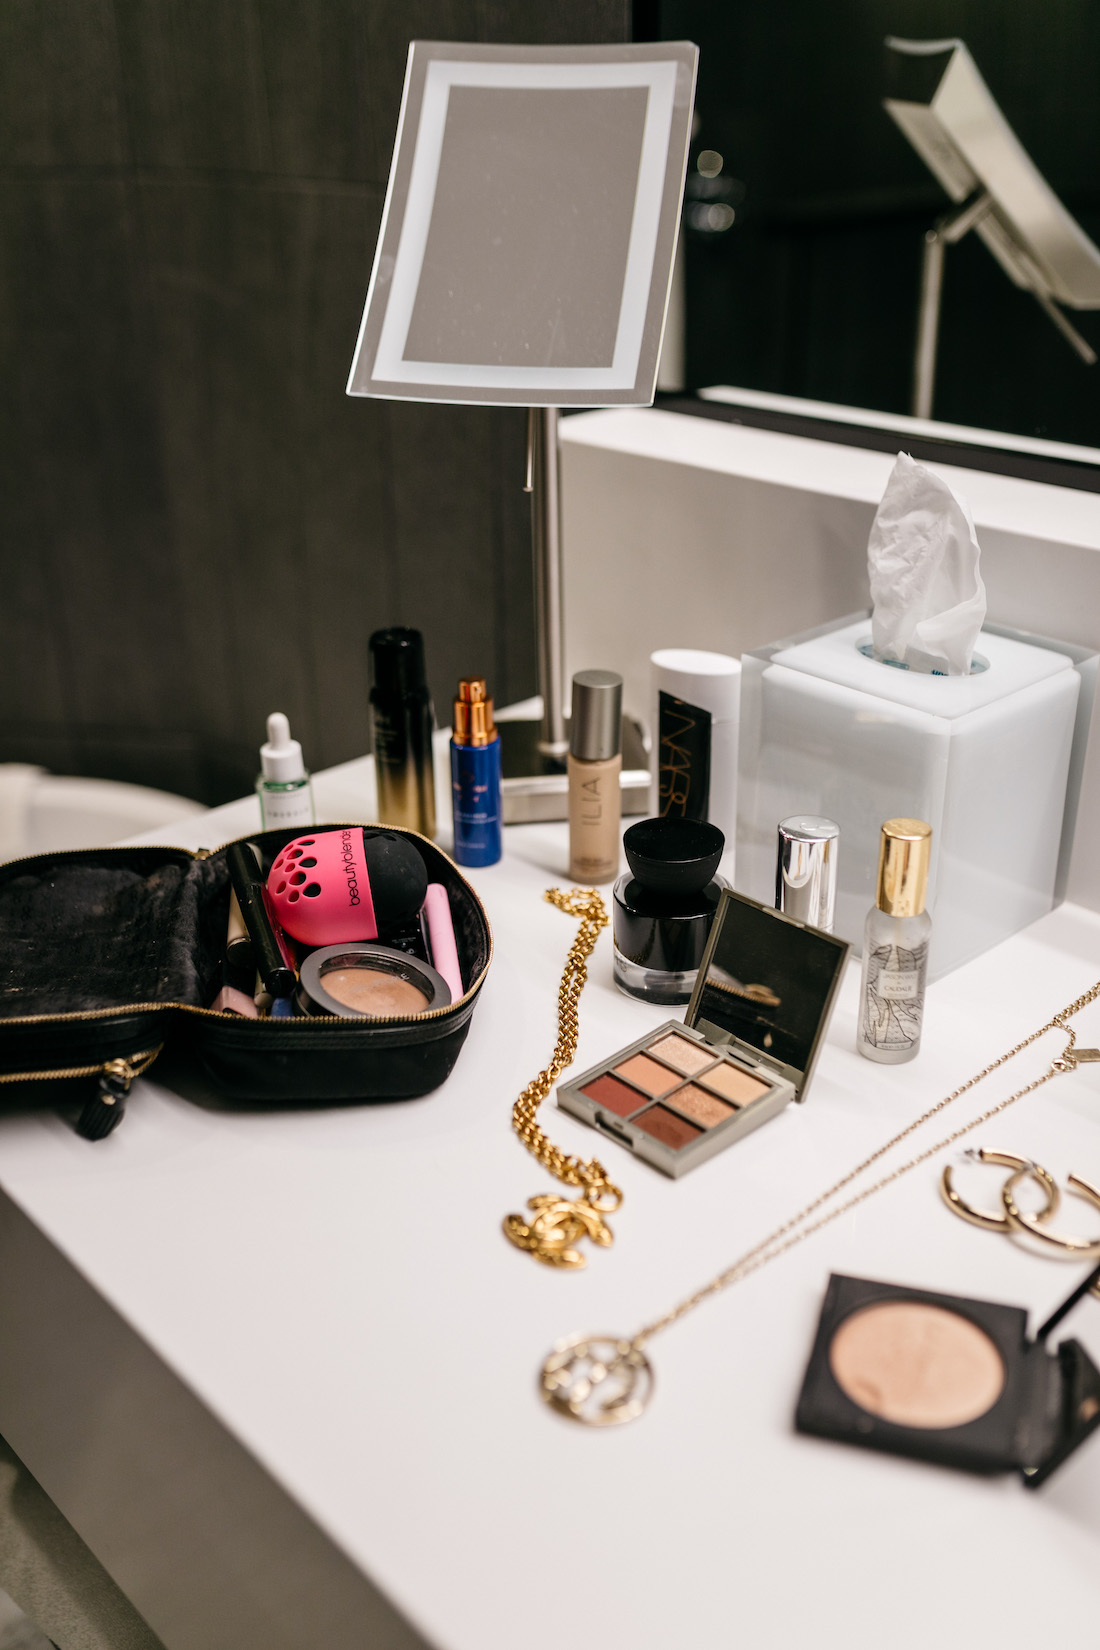 cosmetics and jewelry